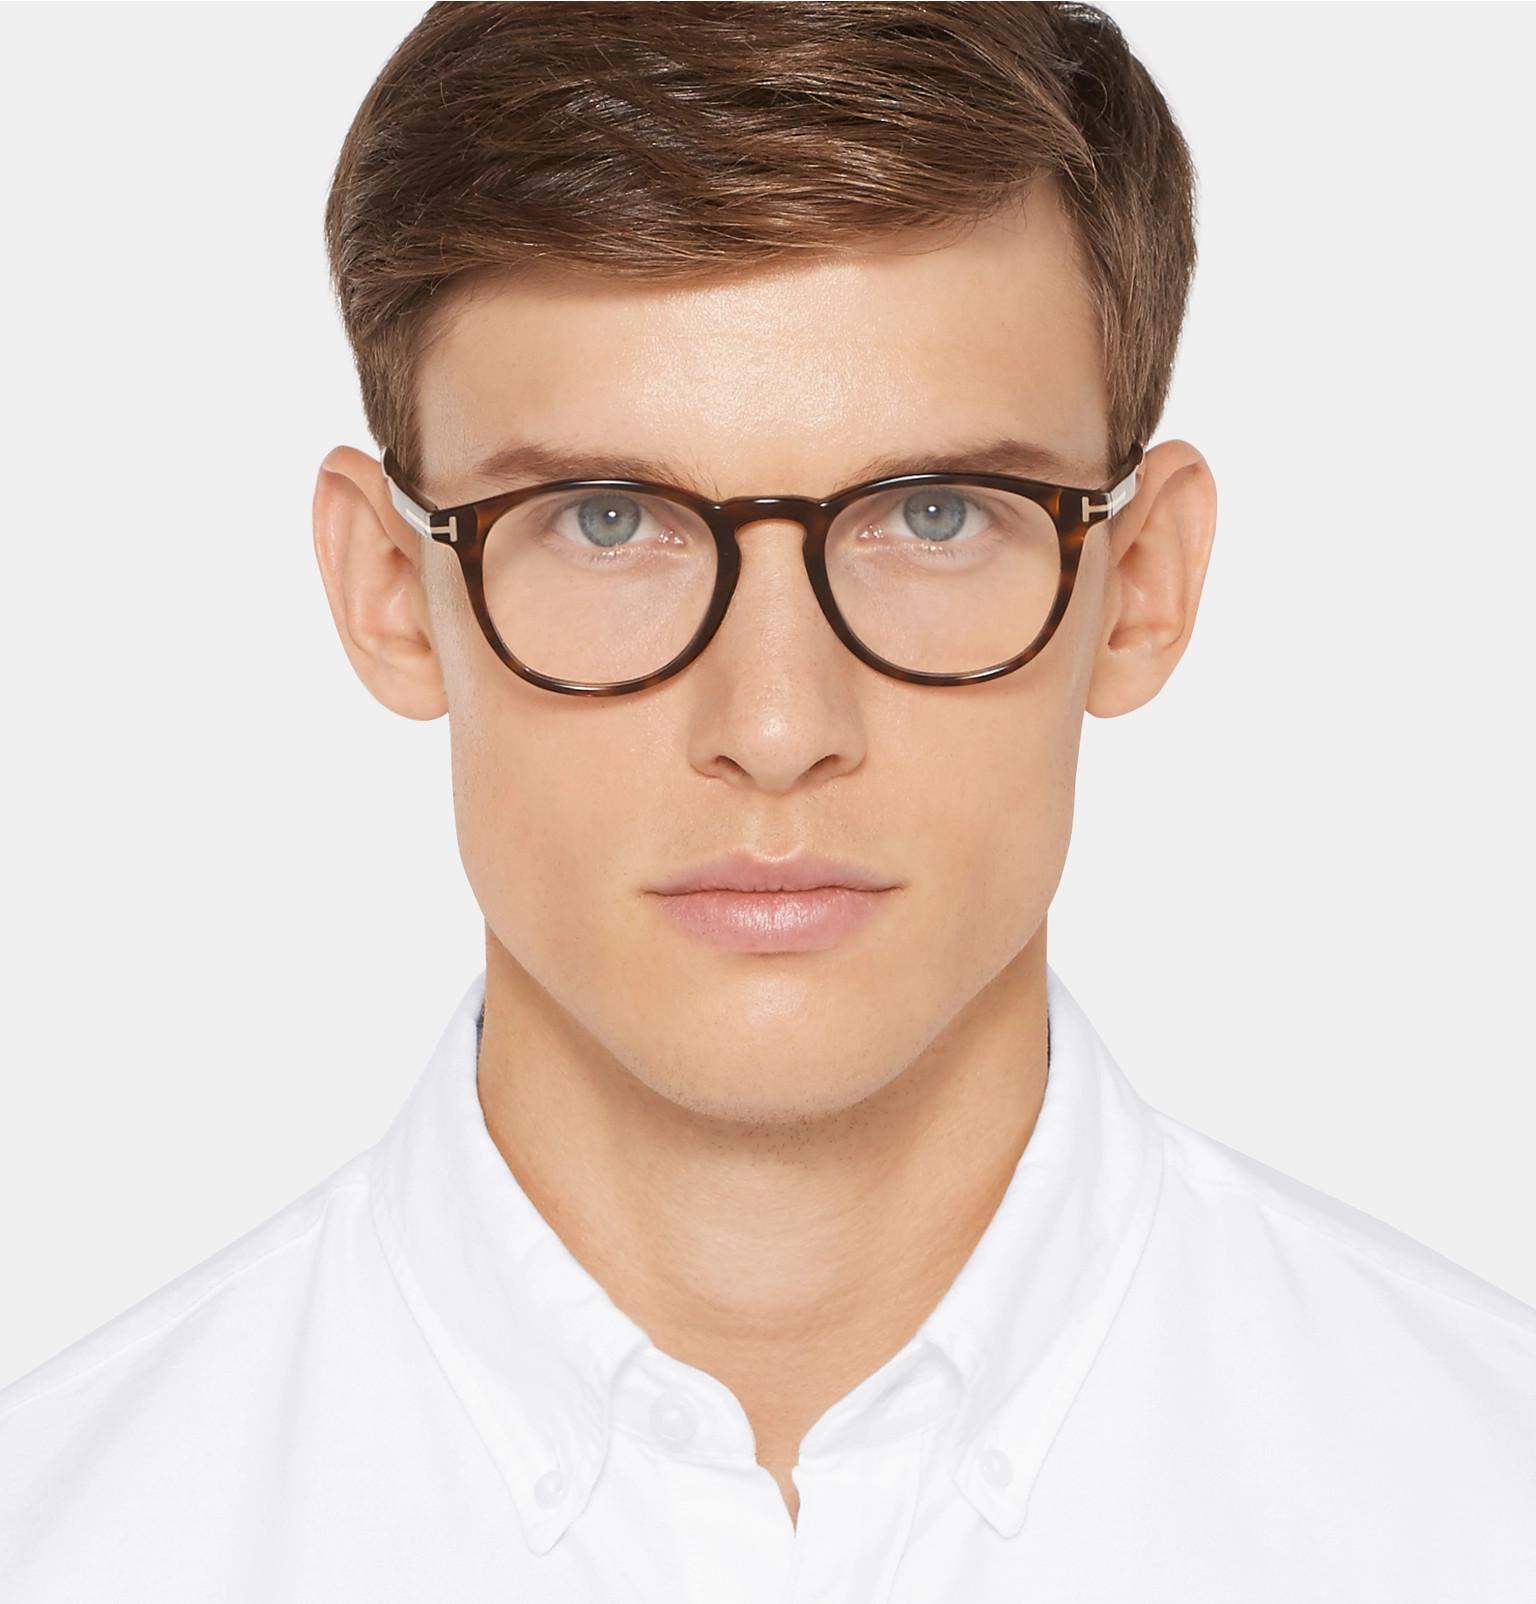 d462ae7442674 TOM FORD - Round-Frame Tortoiseshell Acetate Optical Glasses